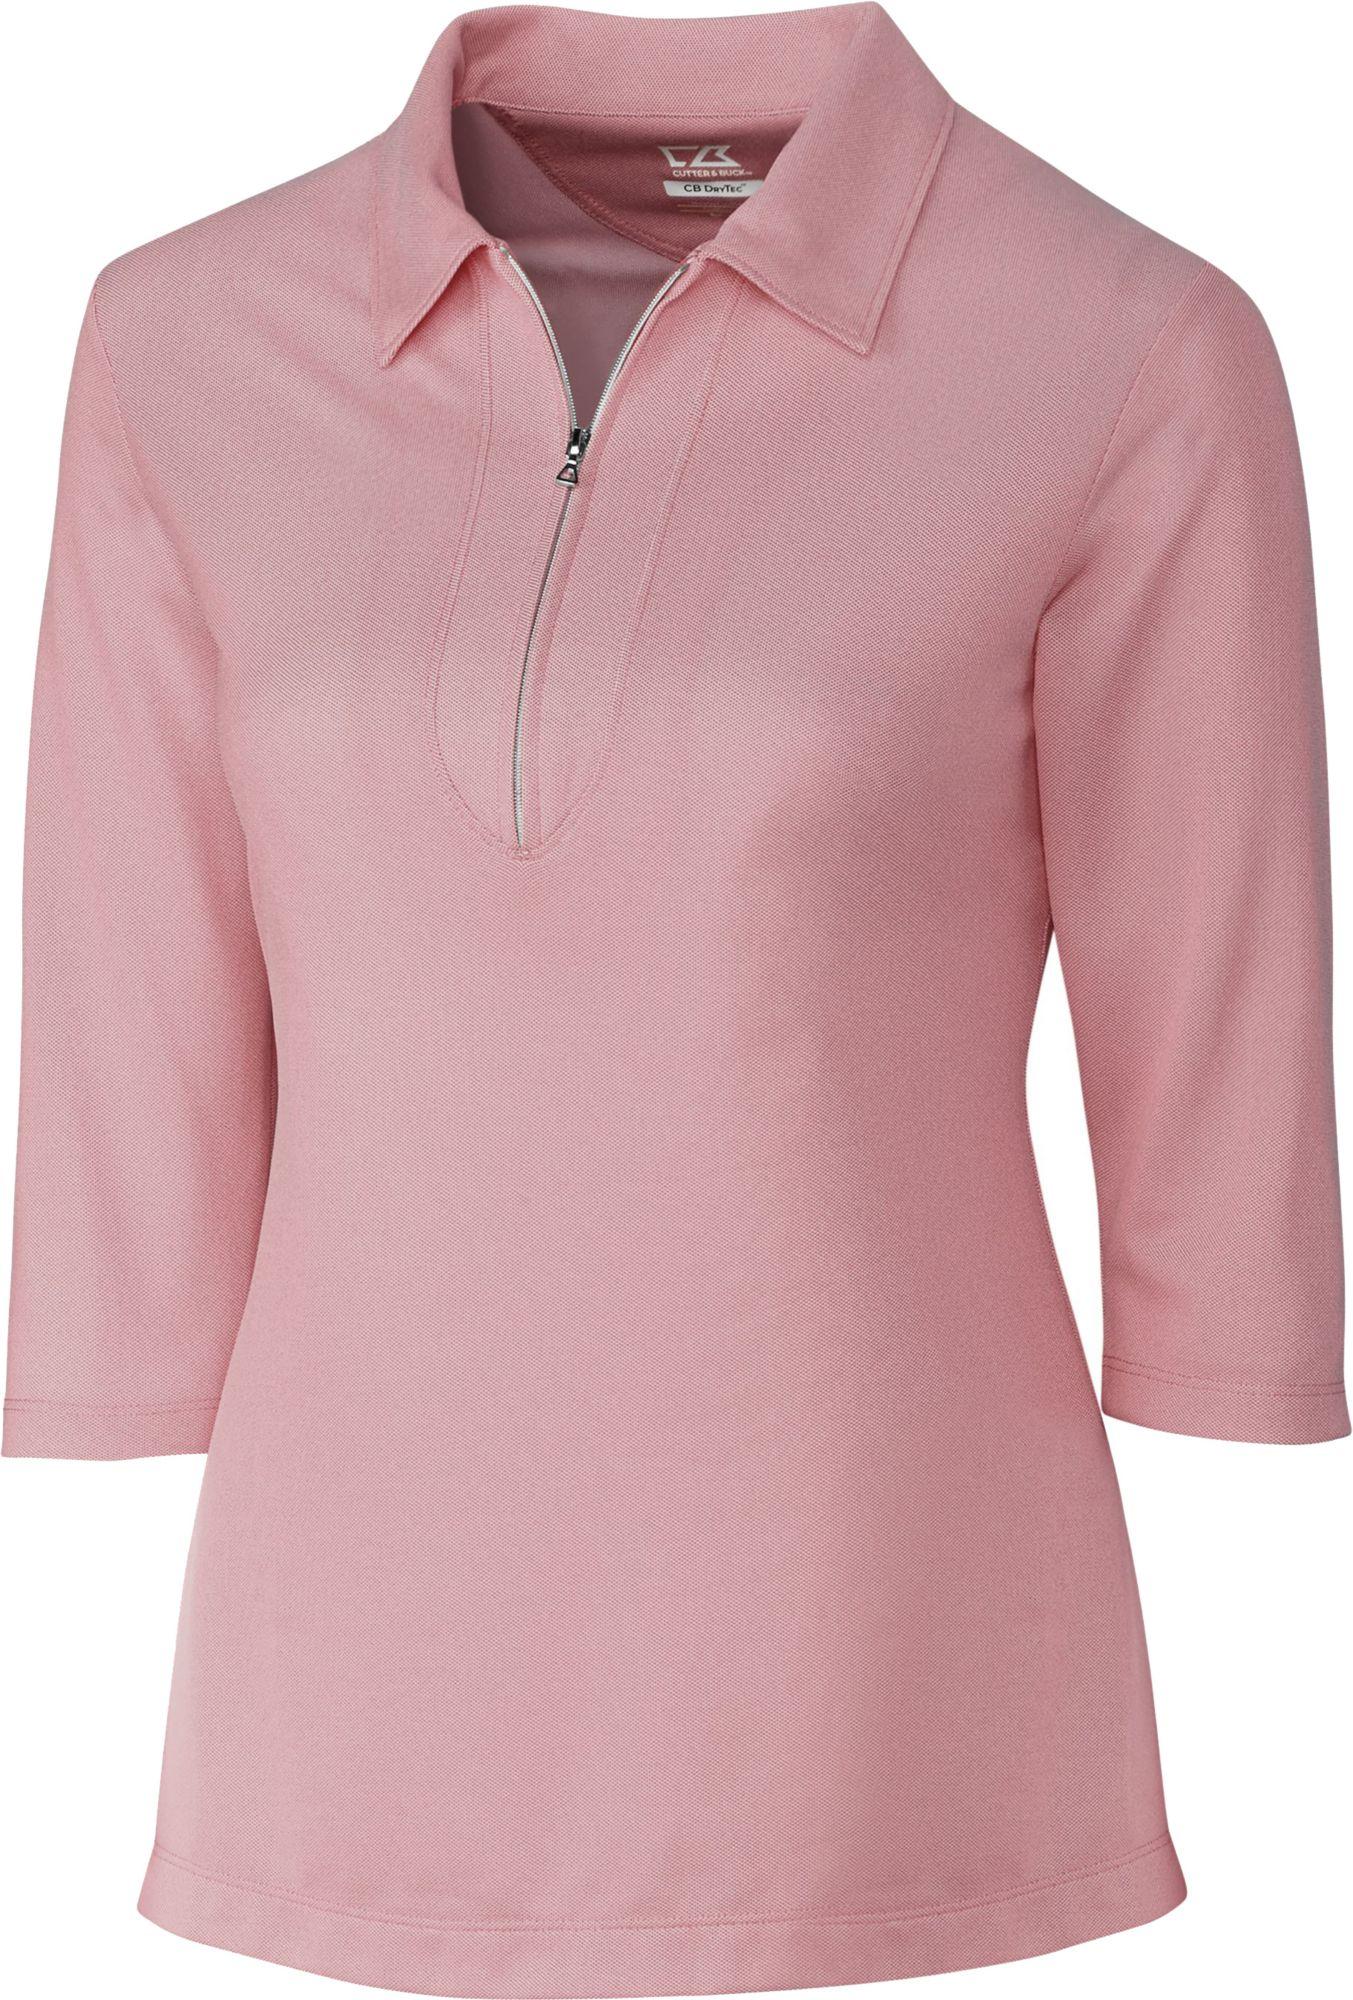 Cutter & Buck Women's Blaine Oxford Three-Quarter Sleeve Zip Golf Polo.  0:00. 0:00 / 0:00. noImageFound ???